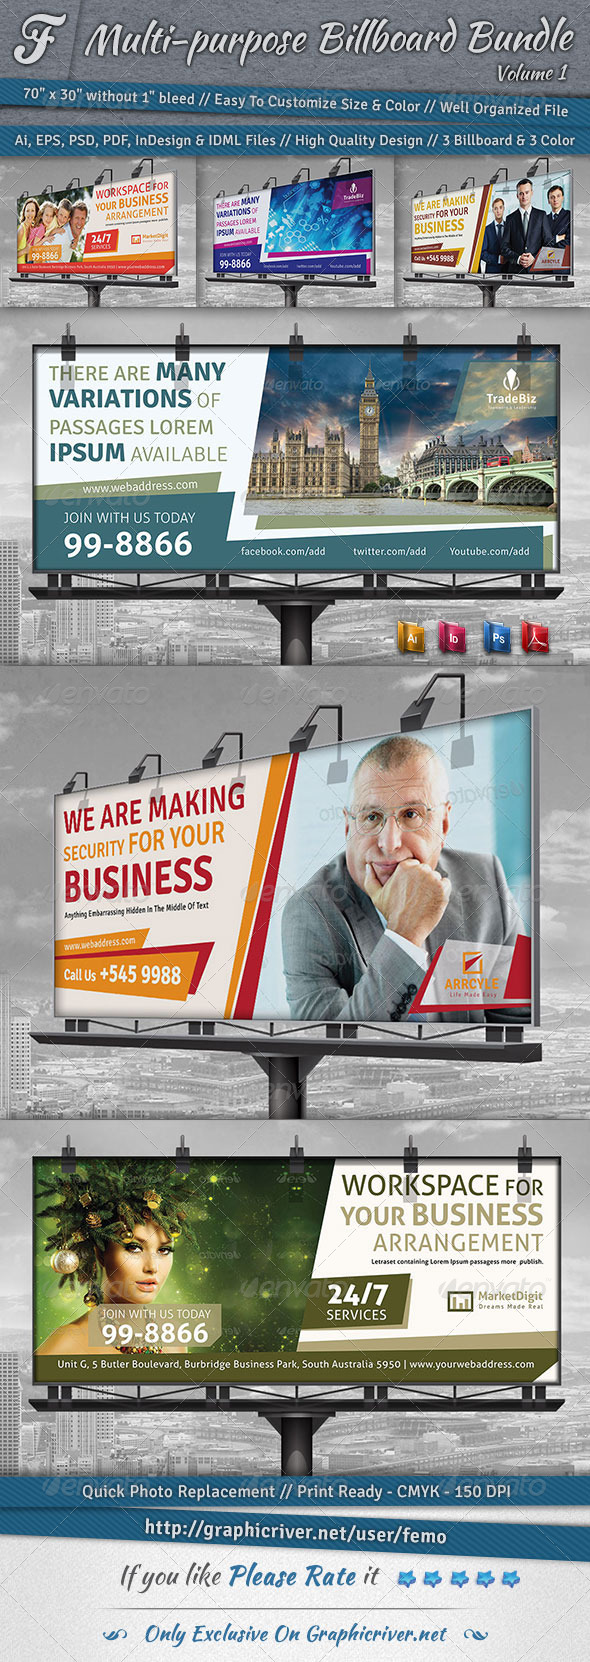 GraphicRiver Multi-purpose Billboard Bundle Volume 1 7144285